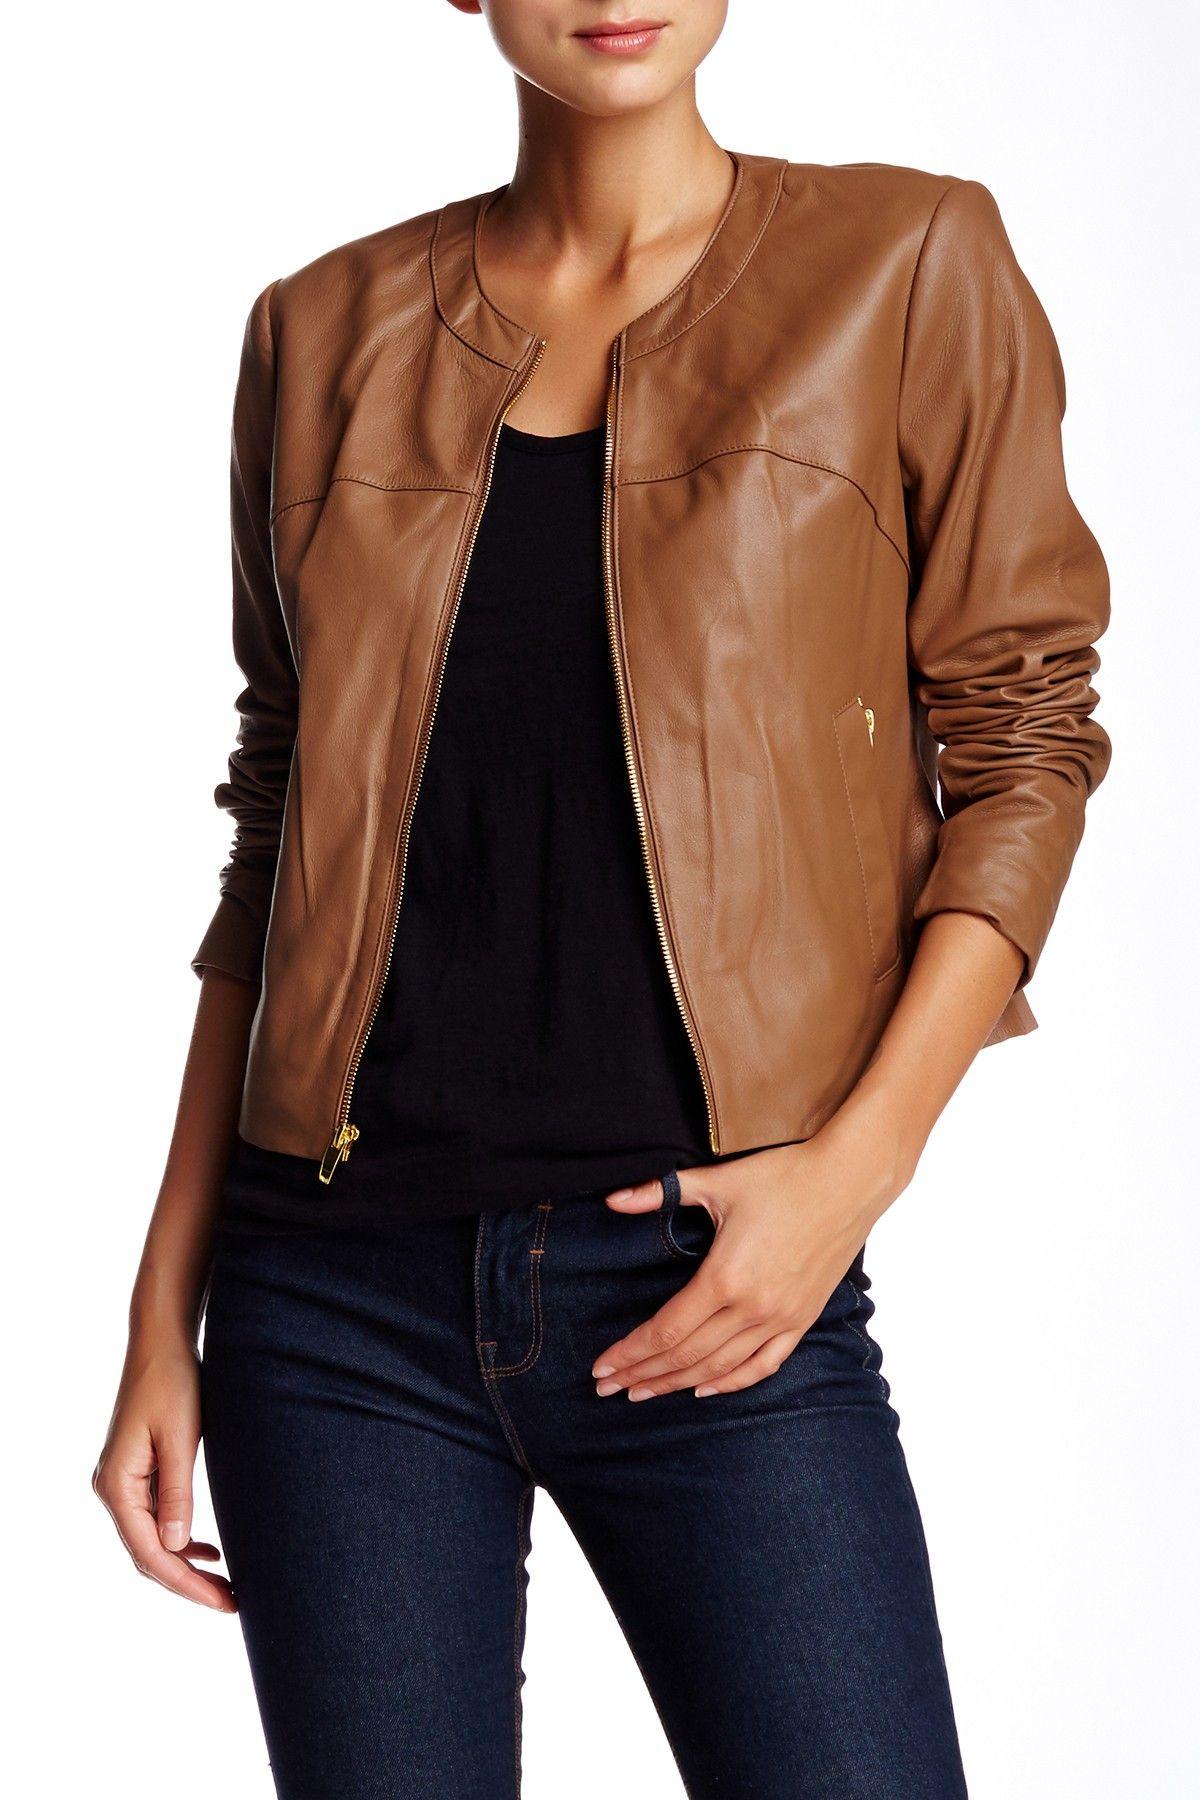 Via Spiga Collarless Leather Jacket Collarless leather